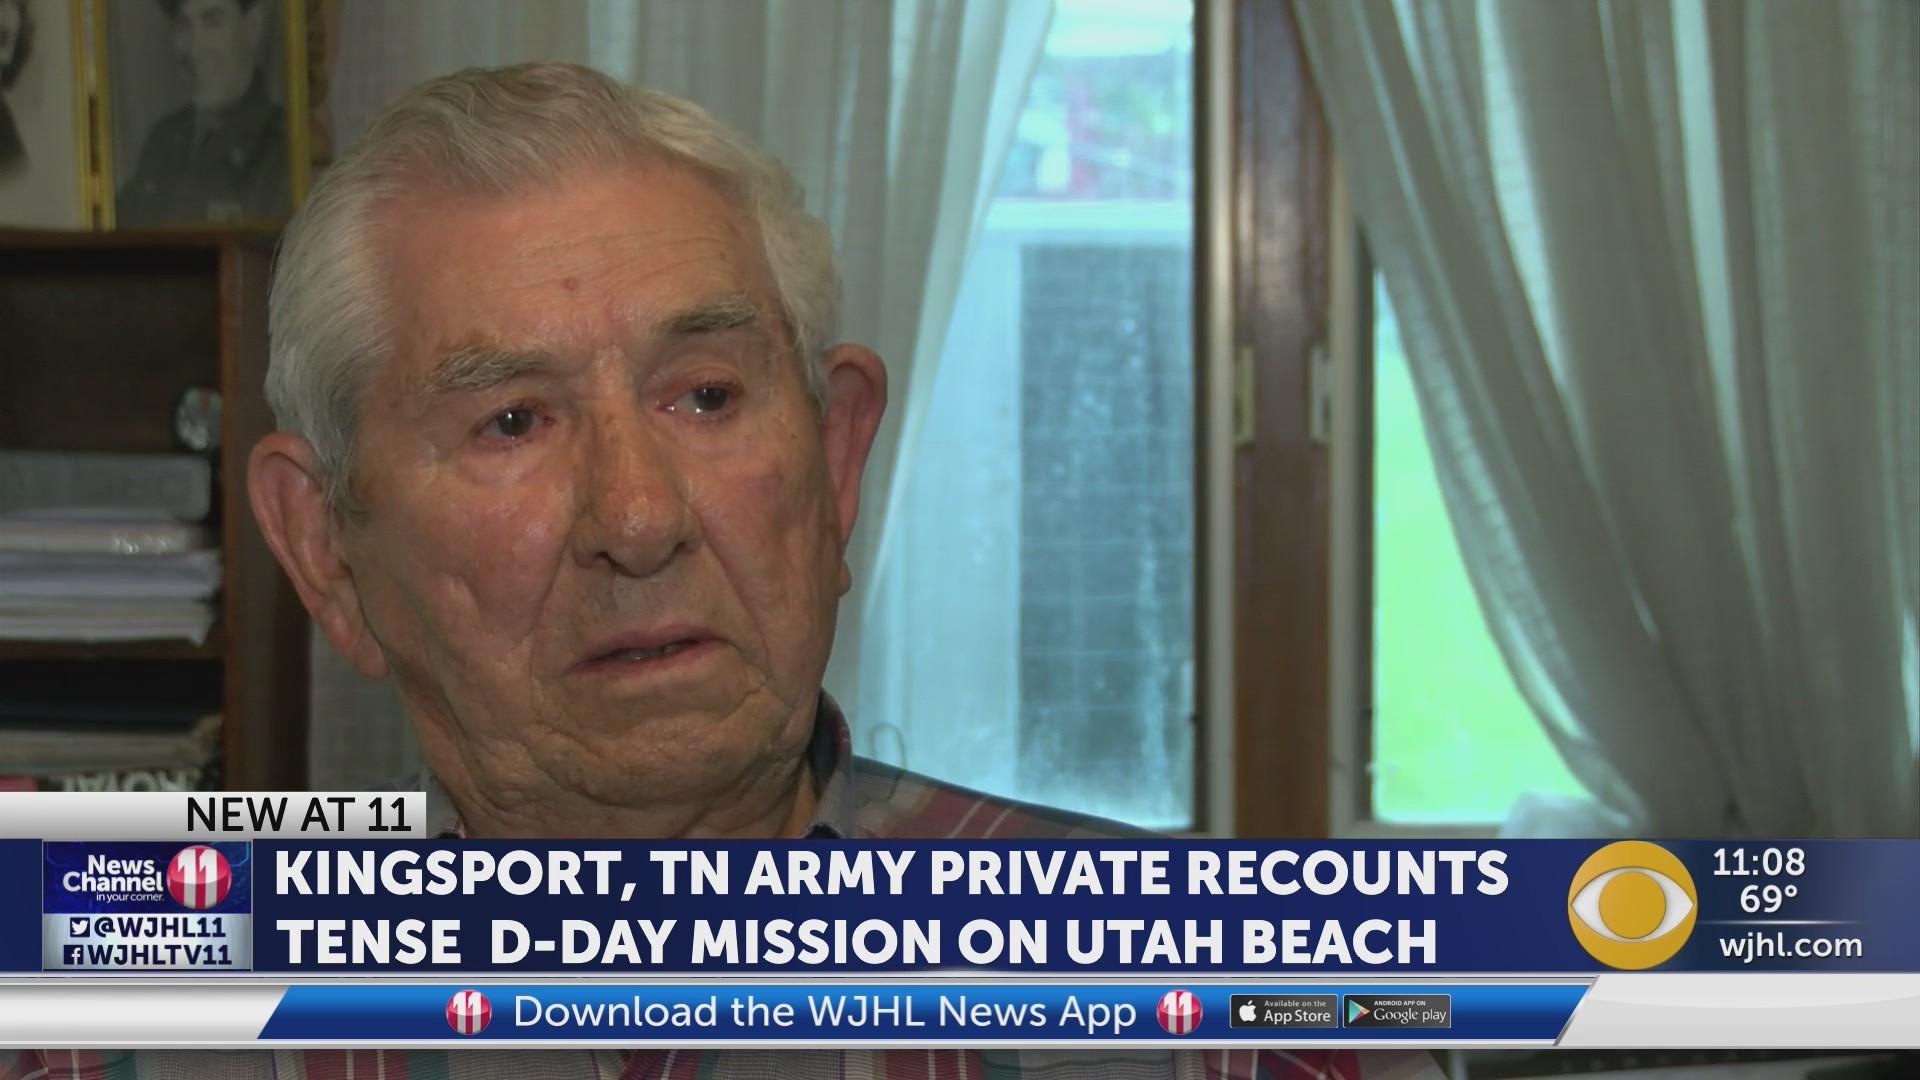 Kingsport, TN Army veteran recounts tense D-Day mission on Utah Beach